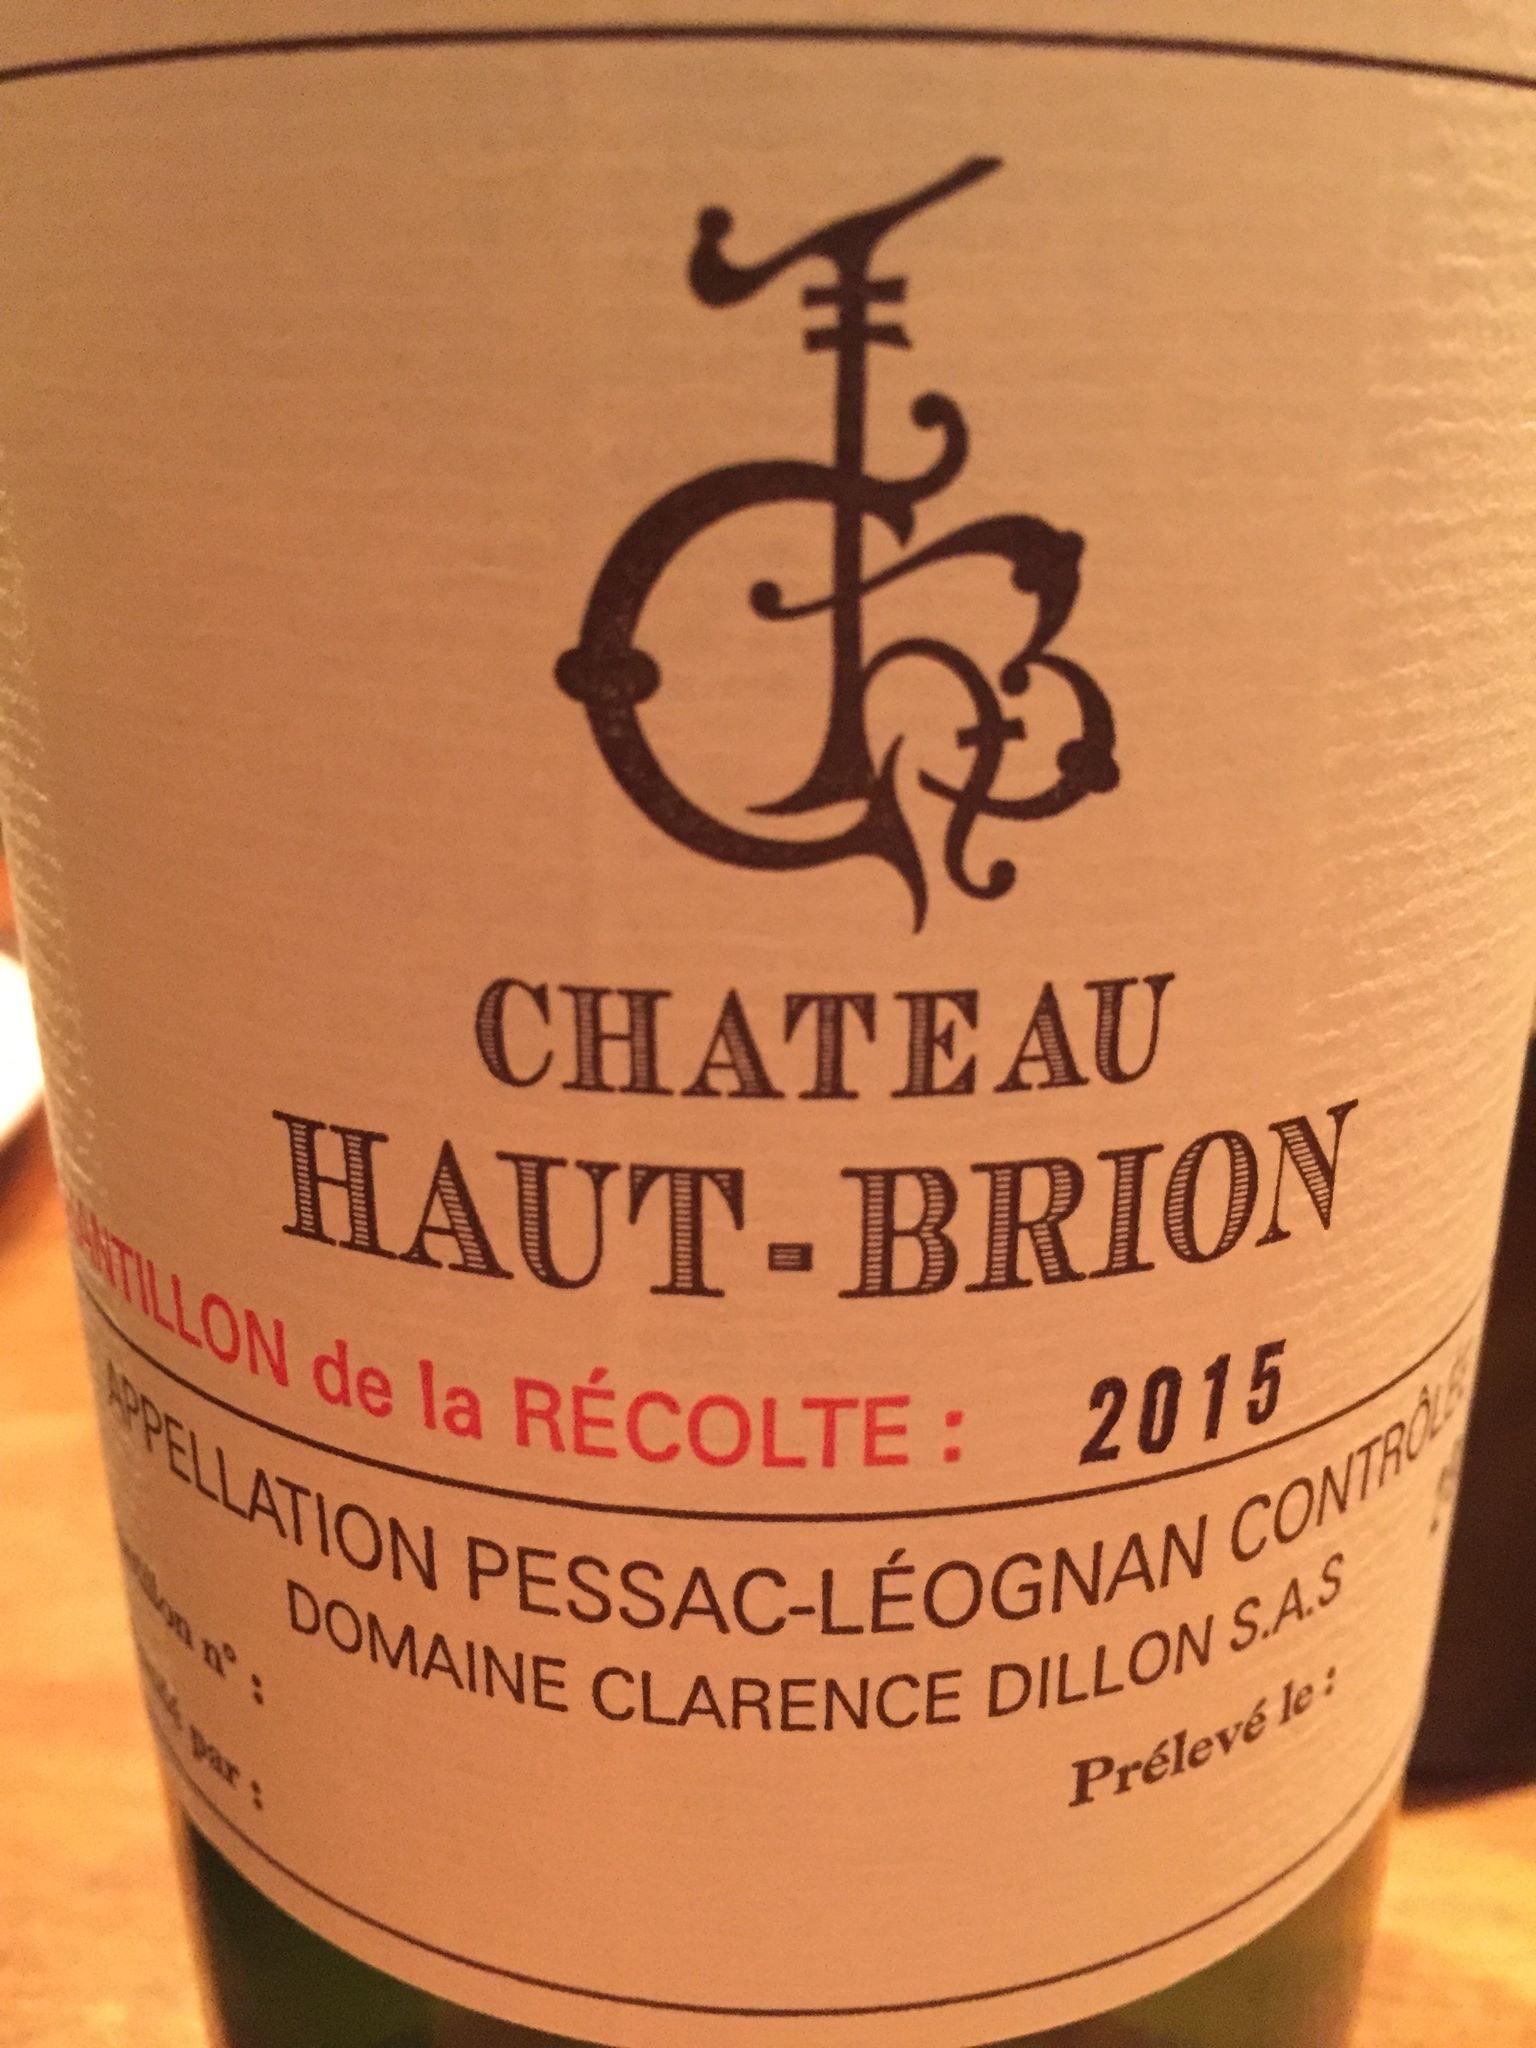 Chateau Haut-Brion 2015 Pessac – Leognan, Grand Cru Classe de Graves